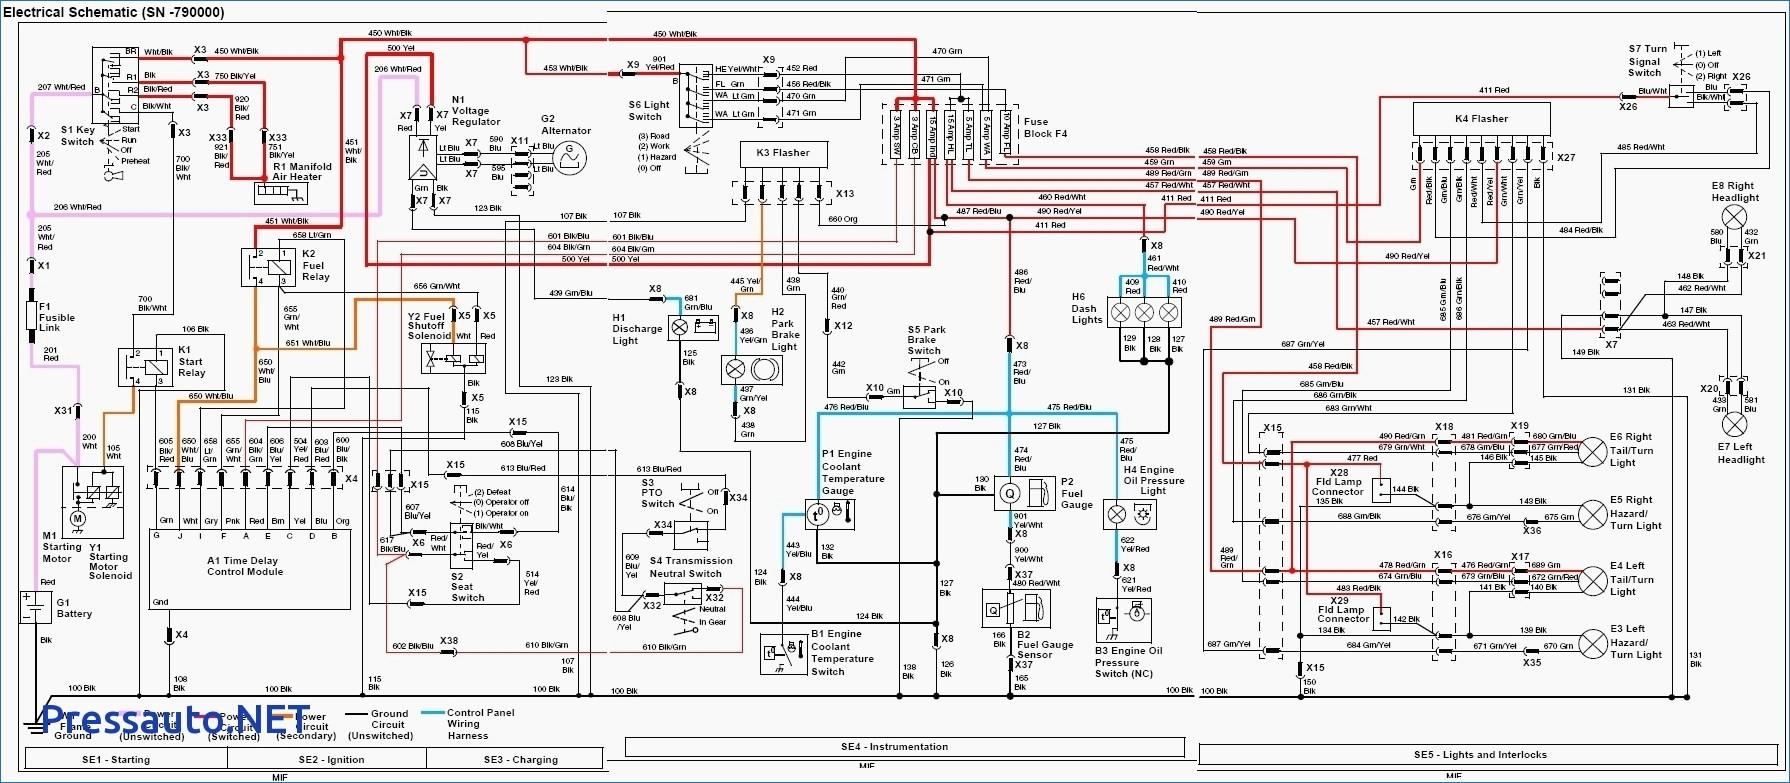 a john deere ignition wiring diagram for model no 584000 seriala john deere ignition wiring diagram for model no 584000 serial rh 17 corpsdemetiersenunclic be